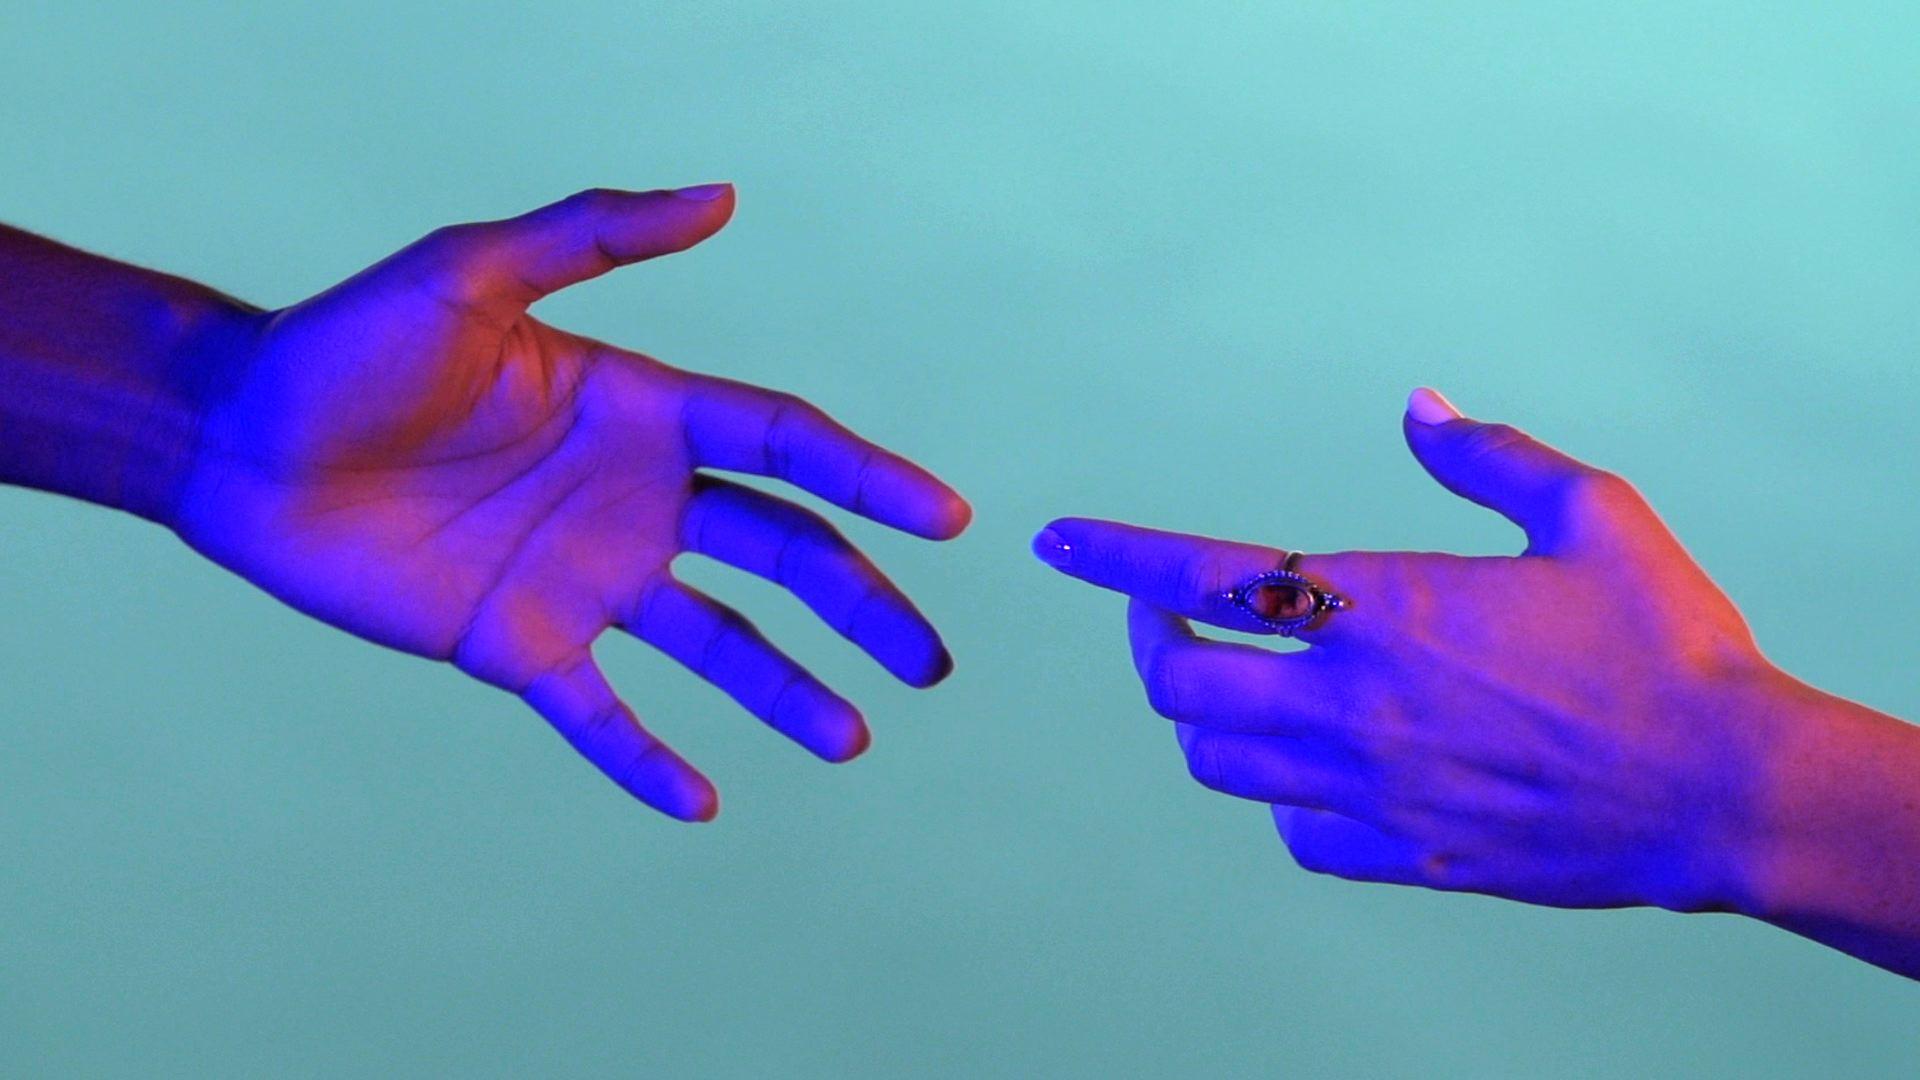 MBU_effigies-still_TWO_BLUE.jpg